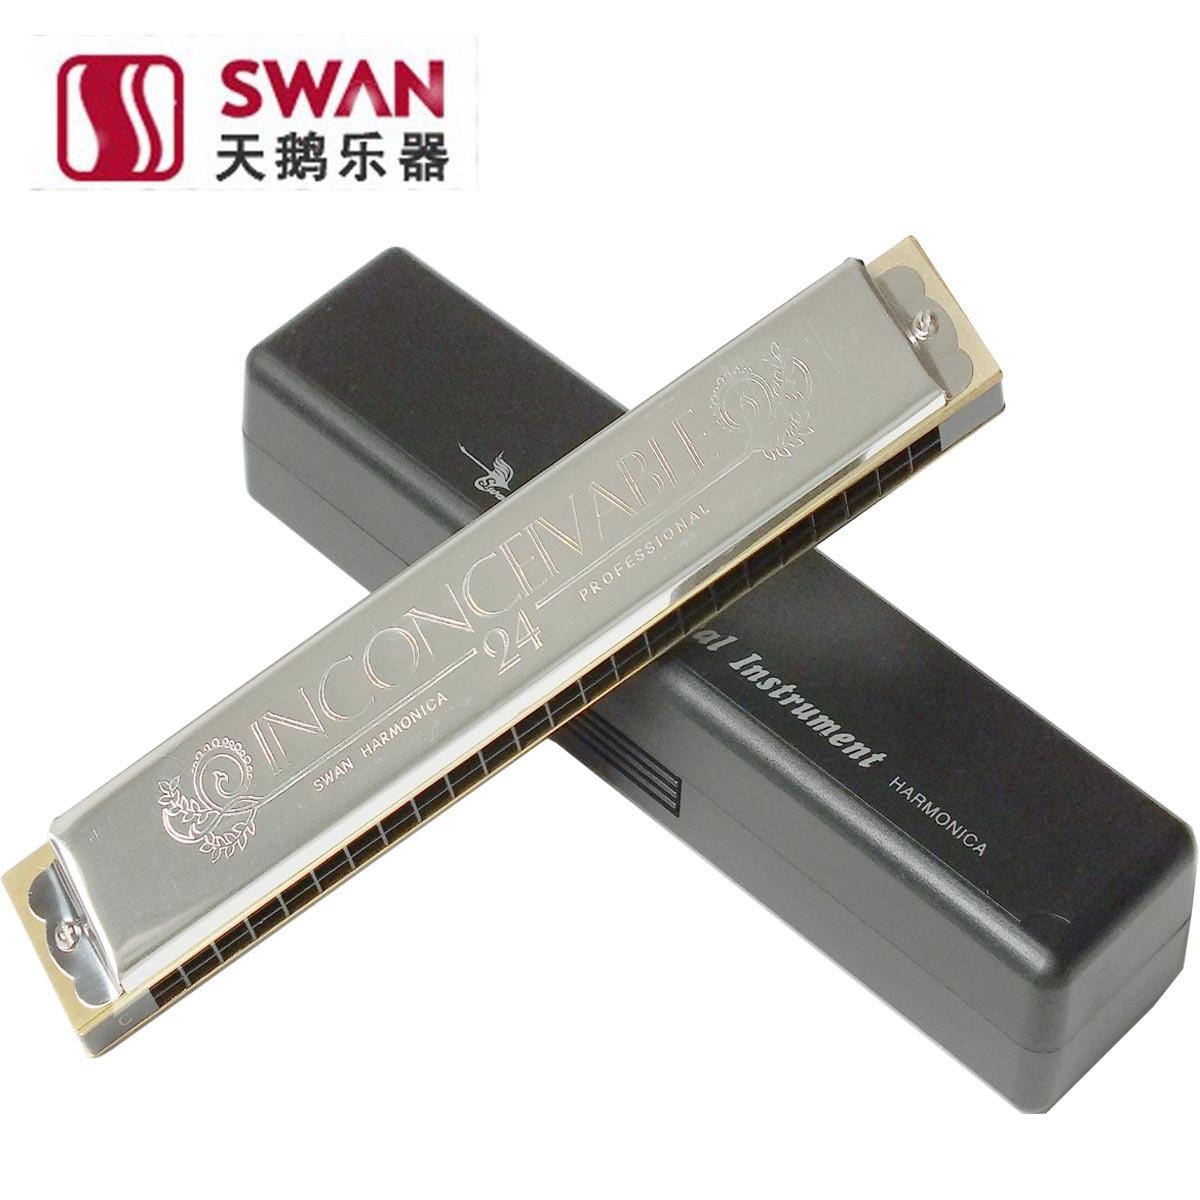 Harmonica c 24 harmonica accent harmonica teaching material book(China (Mainland))